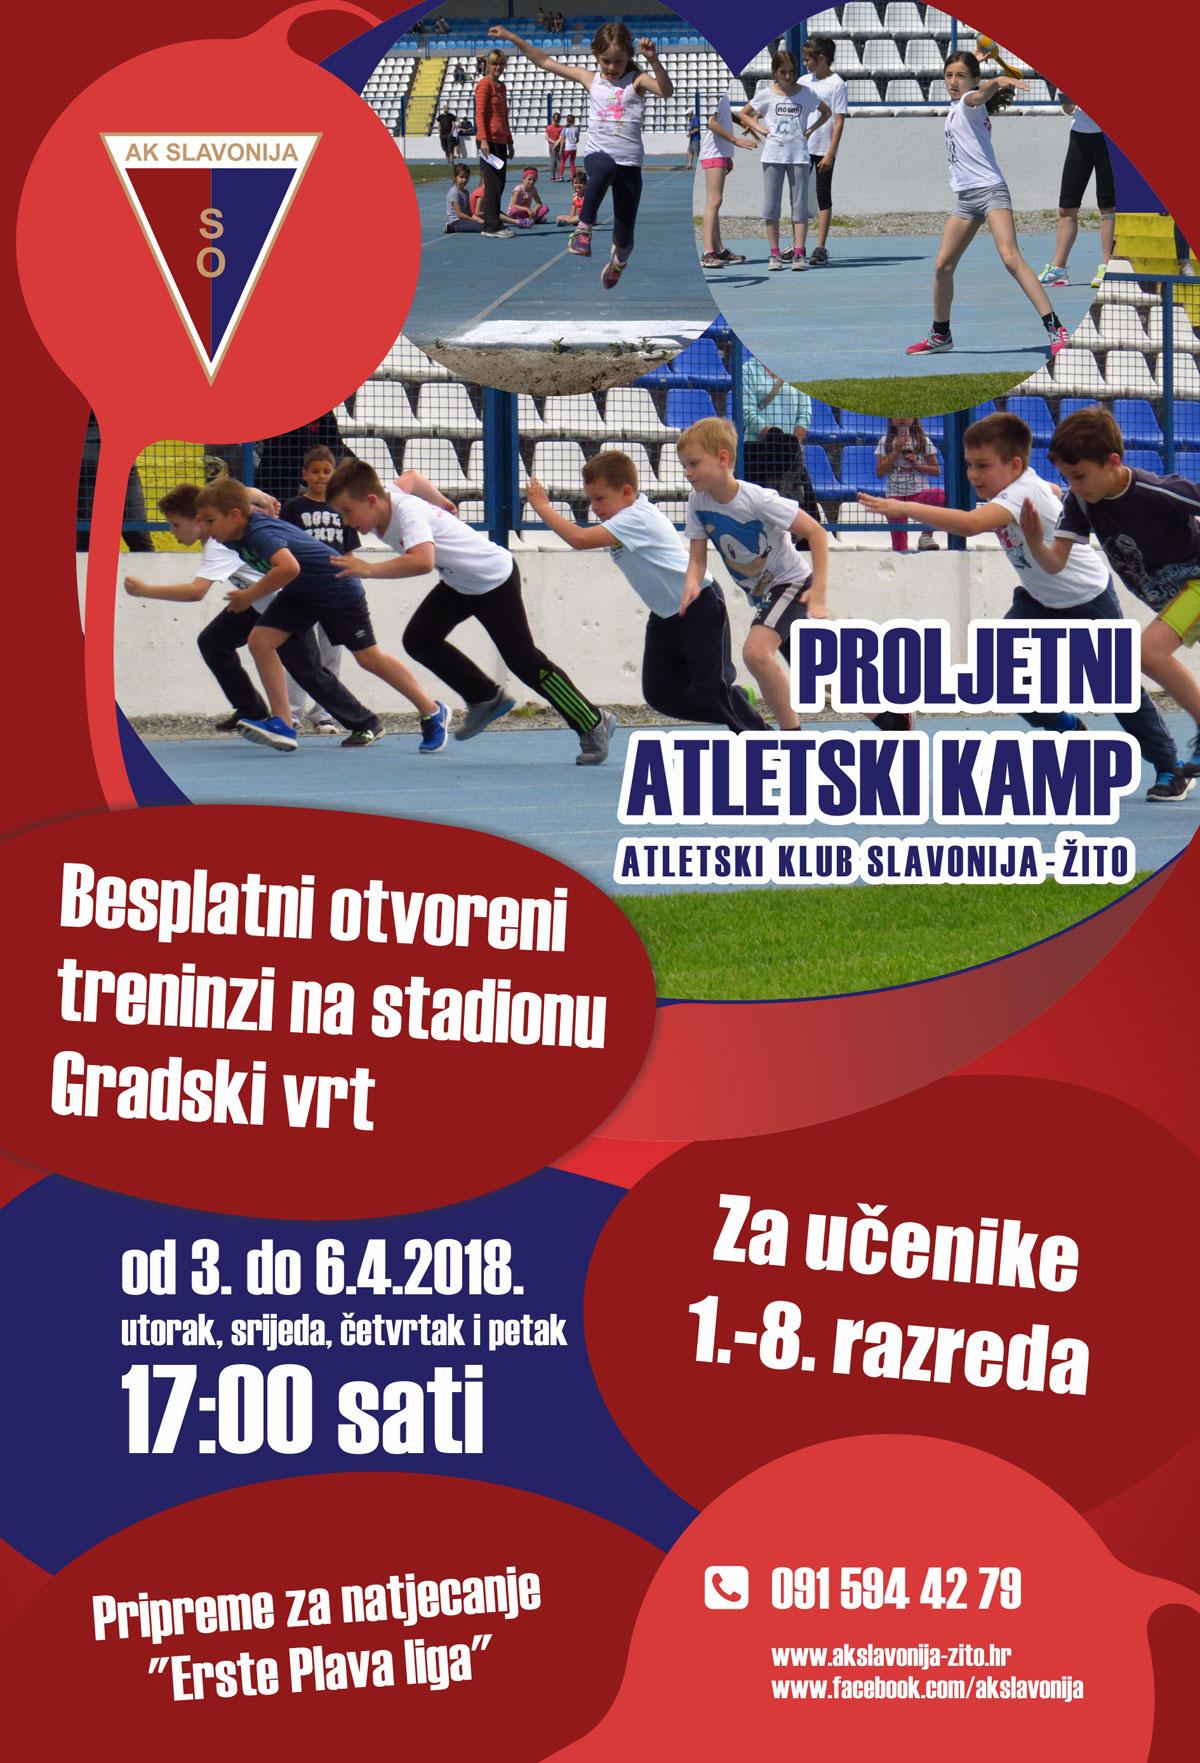 Plakat-Proljetni-atletski-kamp-2018